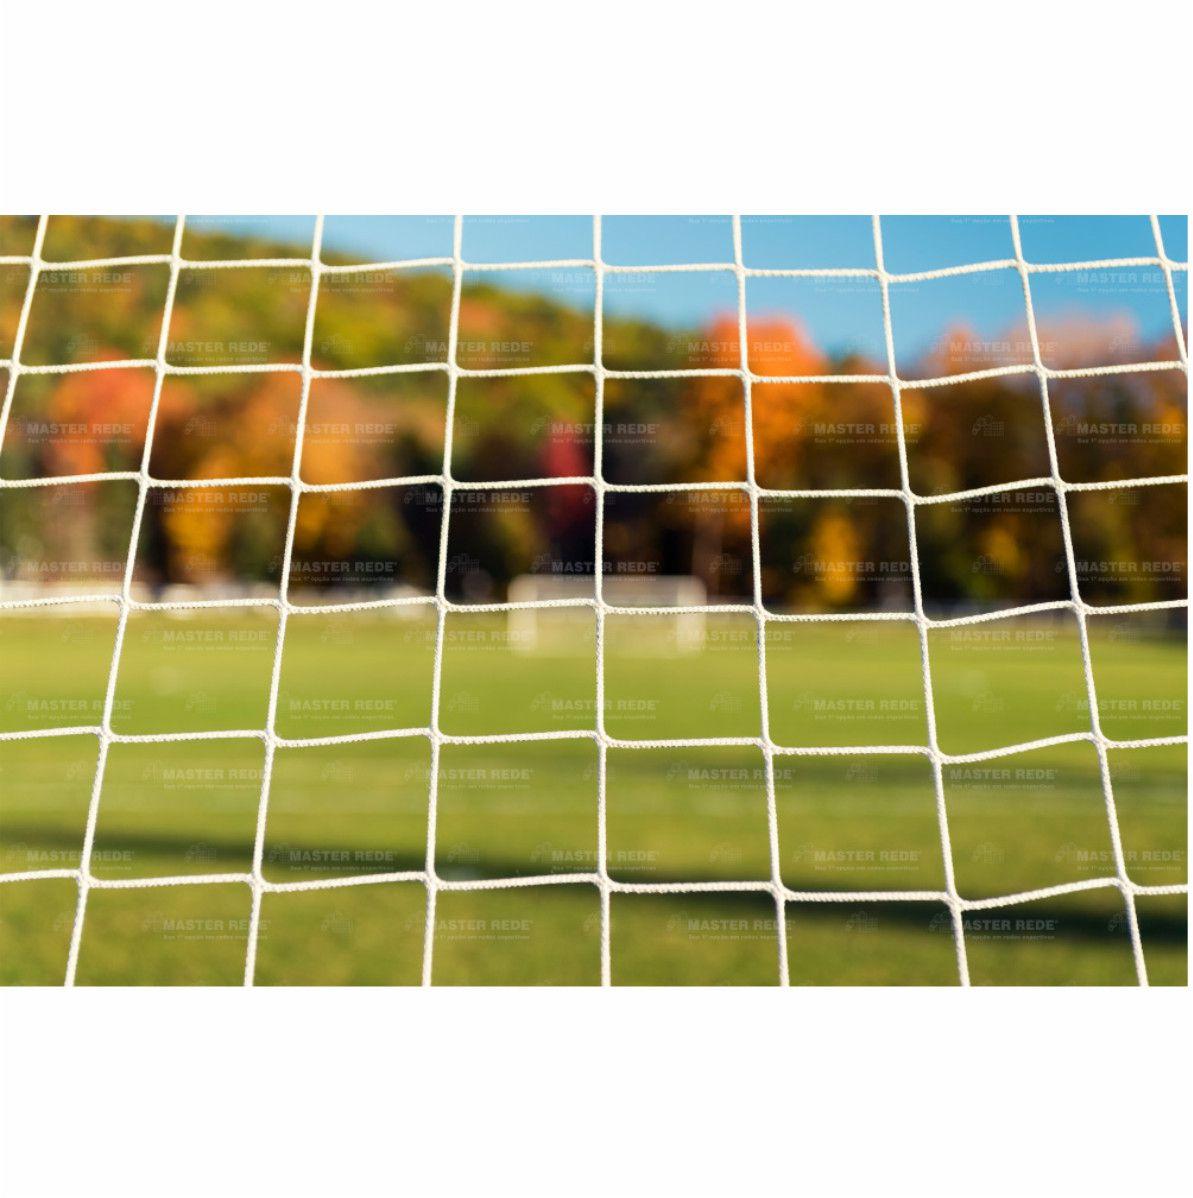 Rede Futebol Suiço Society Master Rede de 5M Fio 4MM Seda F5-L4